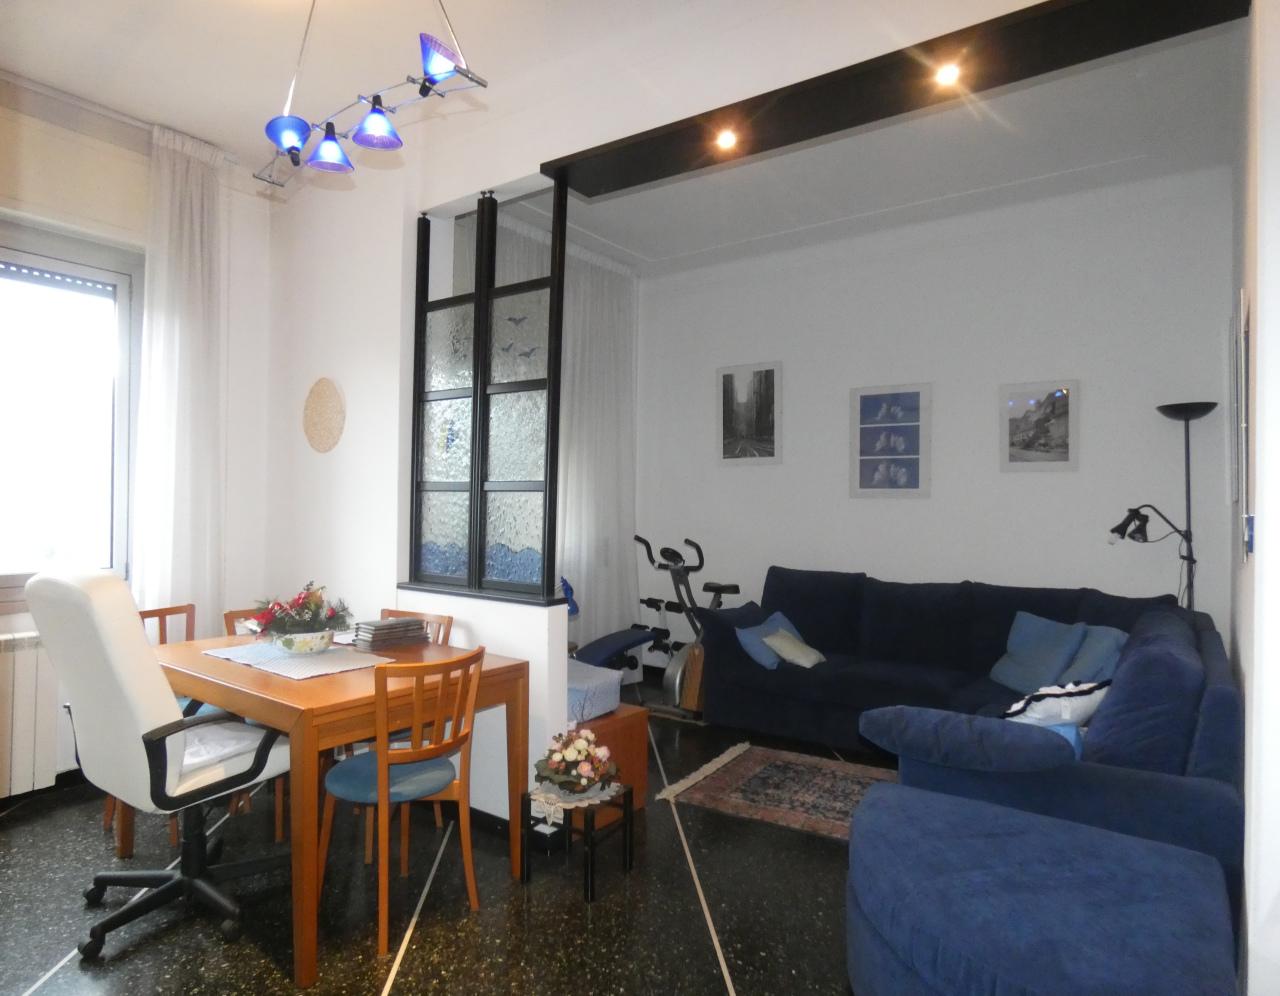 Appartamento a Rivarolo, Genova